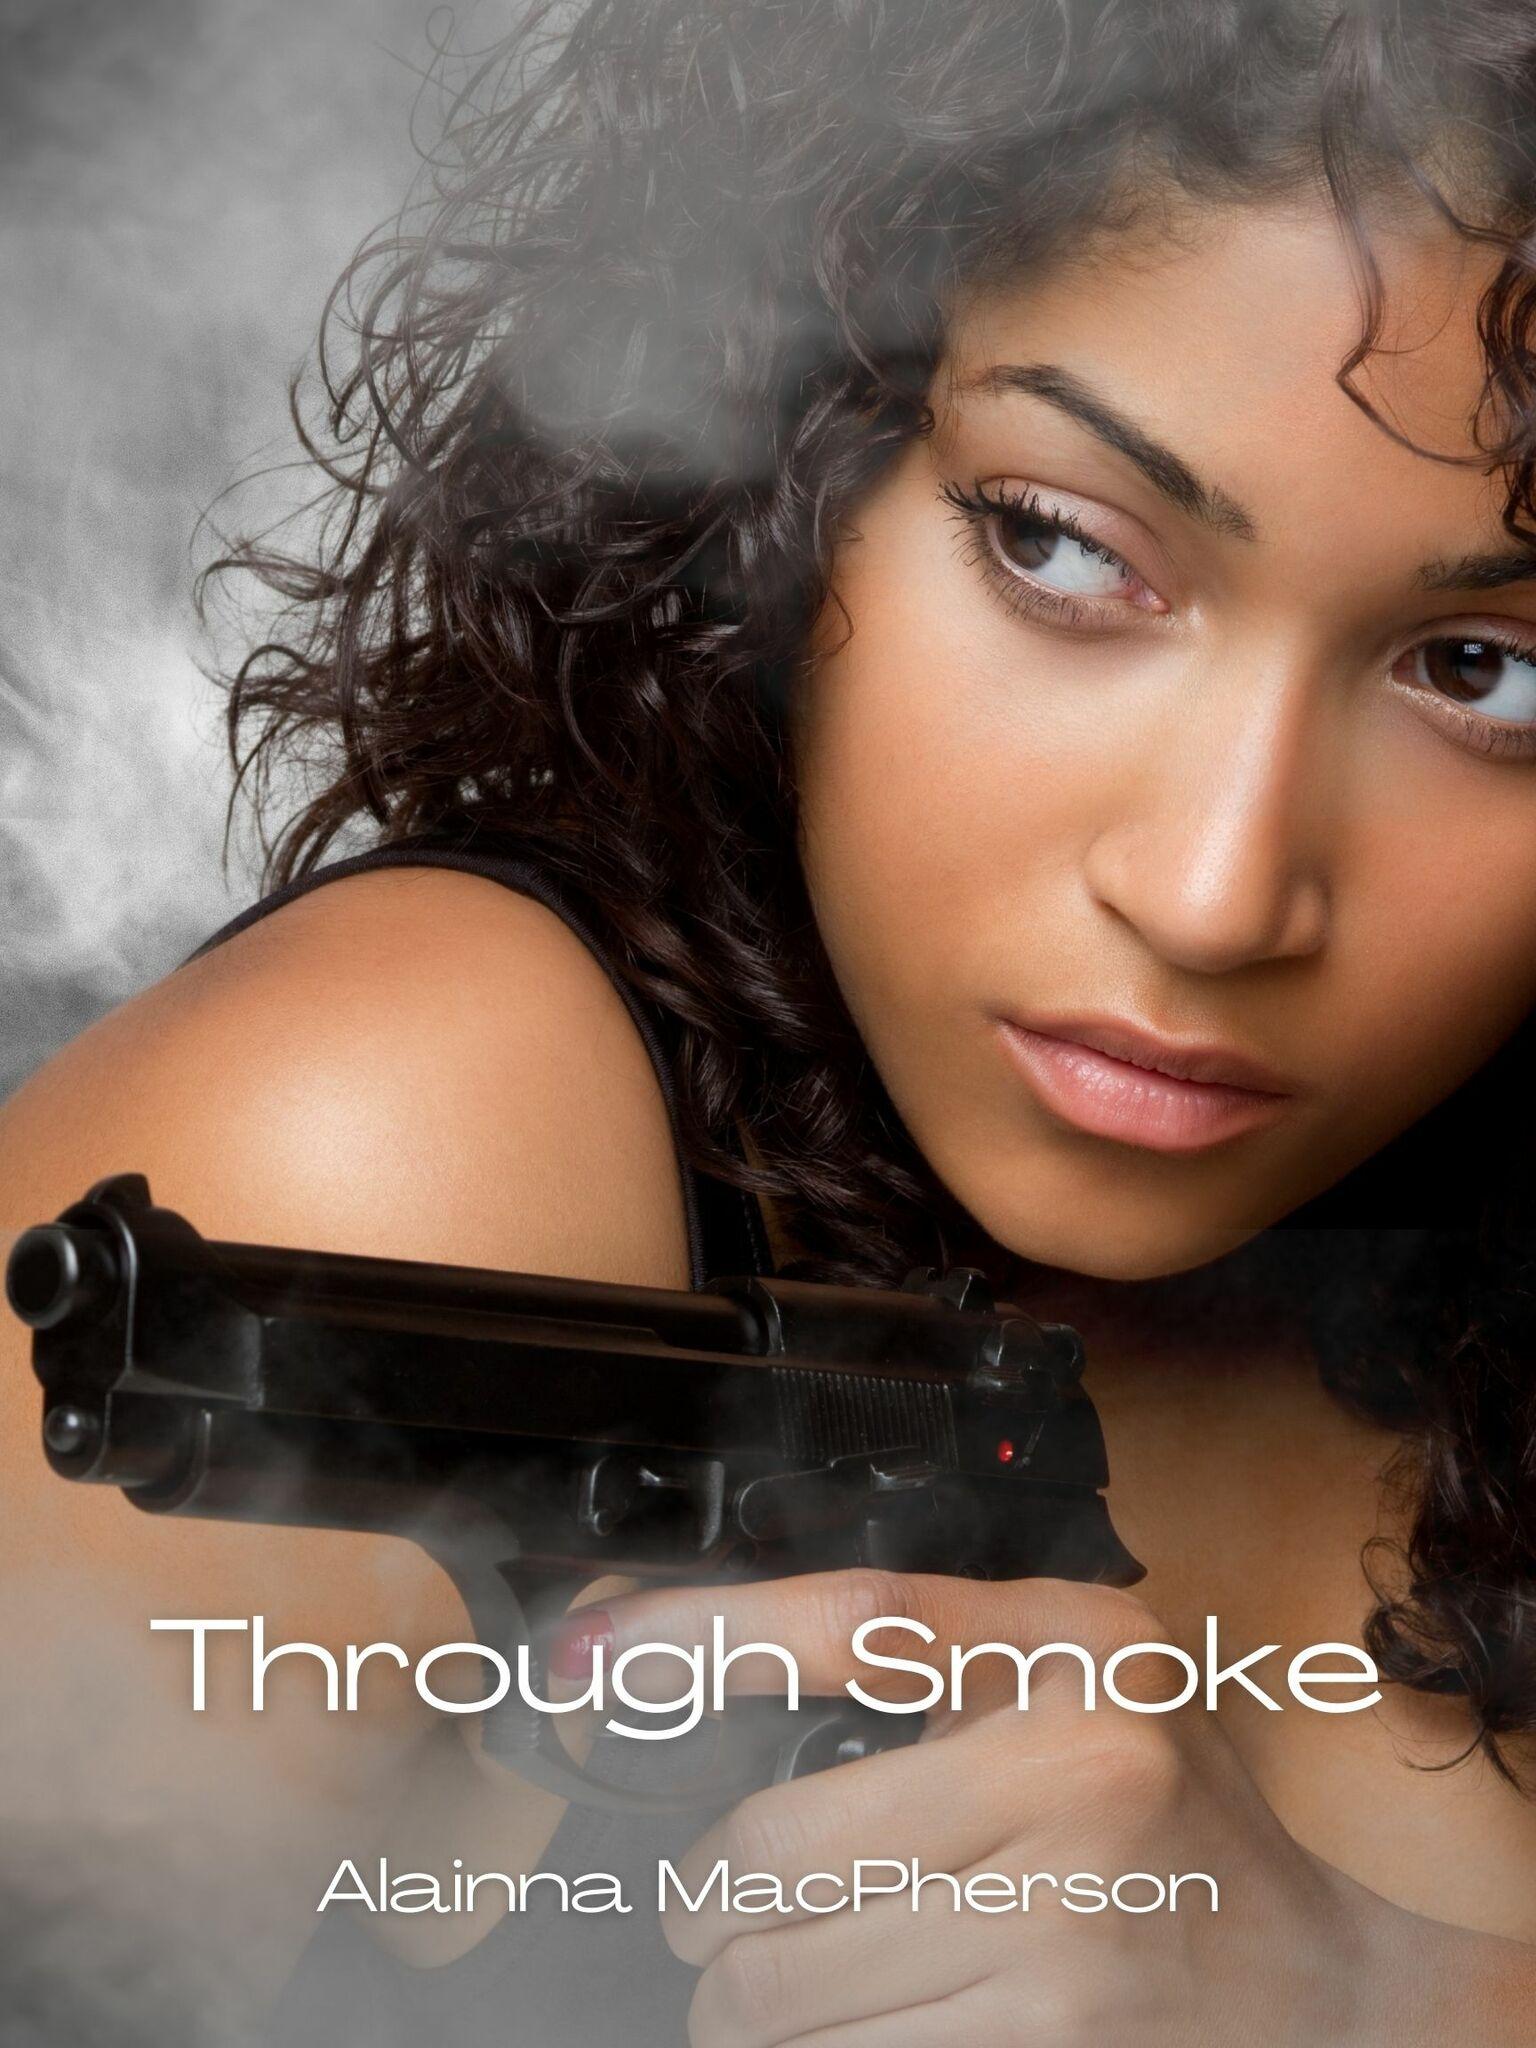 THROUGH SMOKE